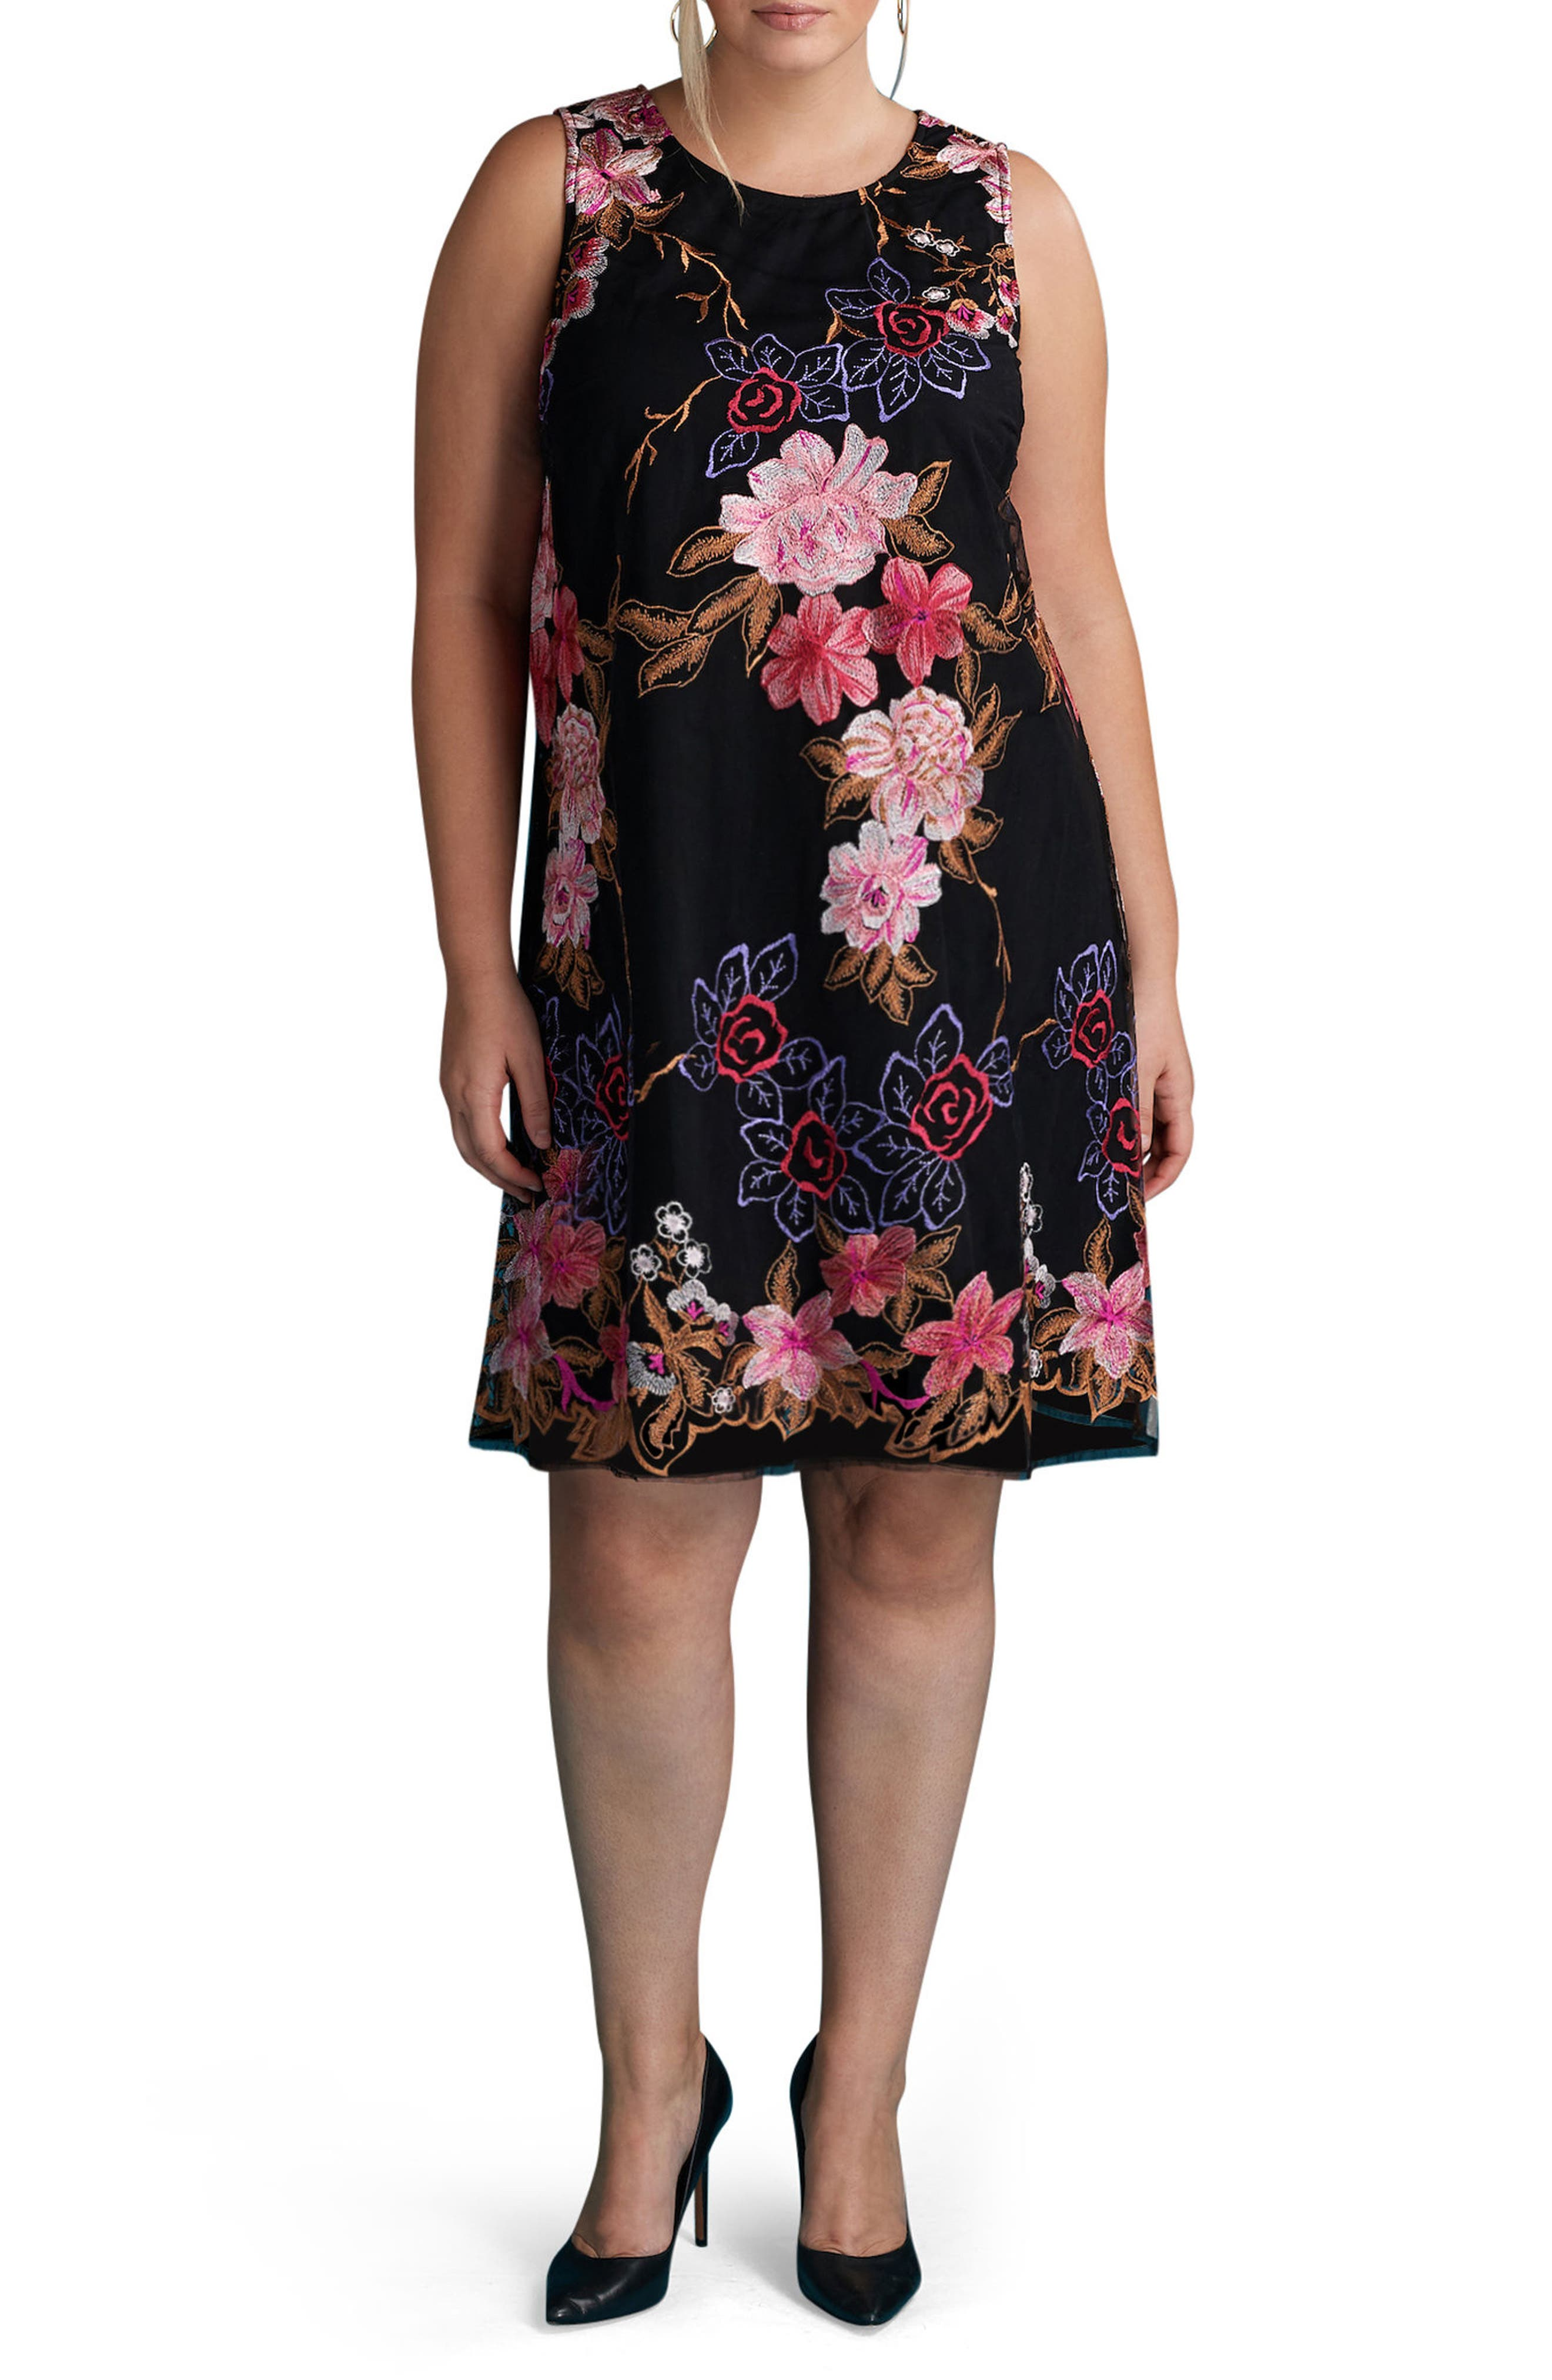 Floral Embroidered Shift Dress,                         Main,                         color, Black/ Pink